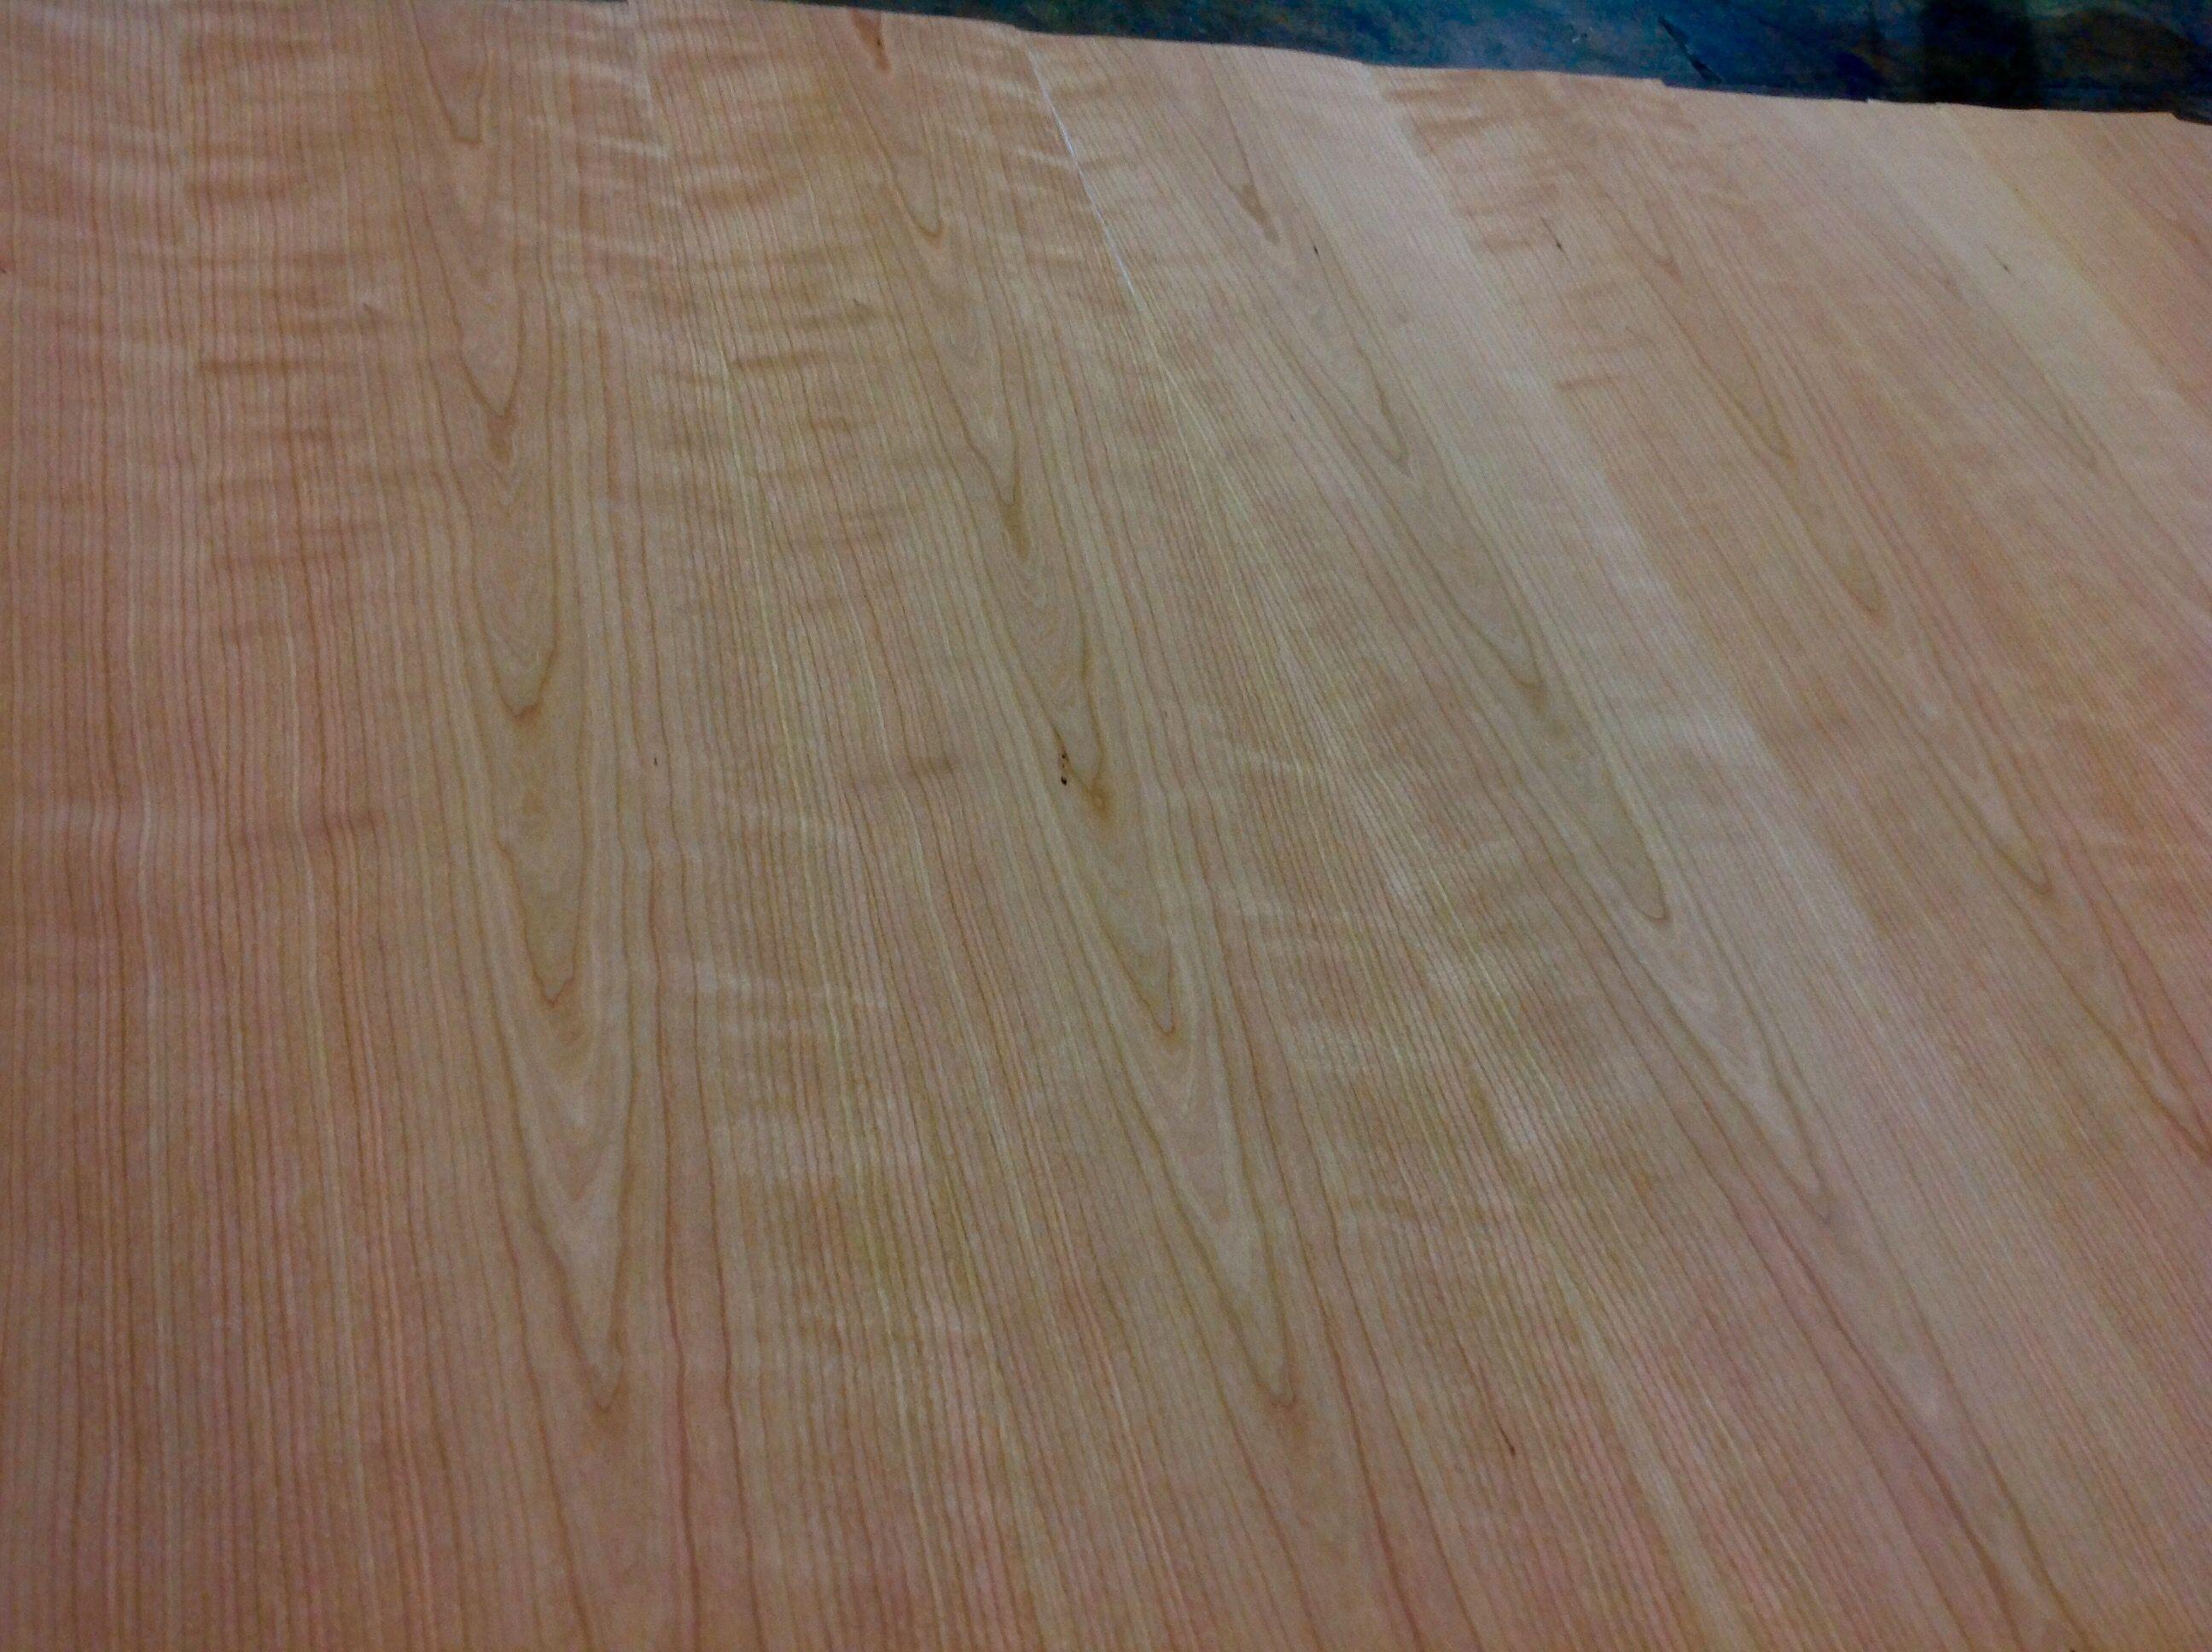 Pressreadycherryappearsmore Morebuyarchitecturalcherryplywood Moret905 669 6800canada Design Millwork Cabinets Interi Wood Veneer Hardwood Plywood Millwork